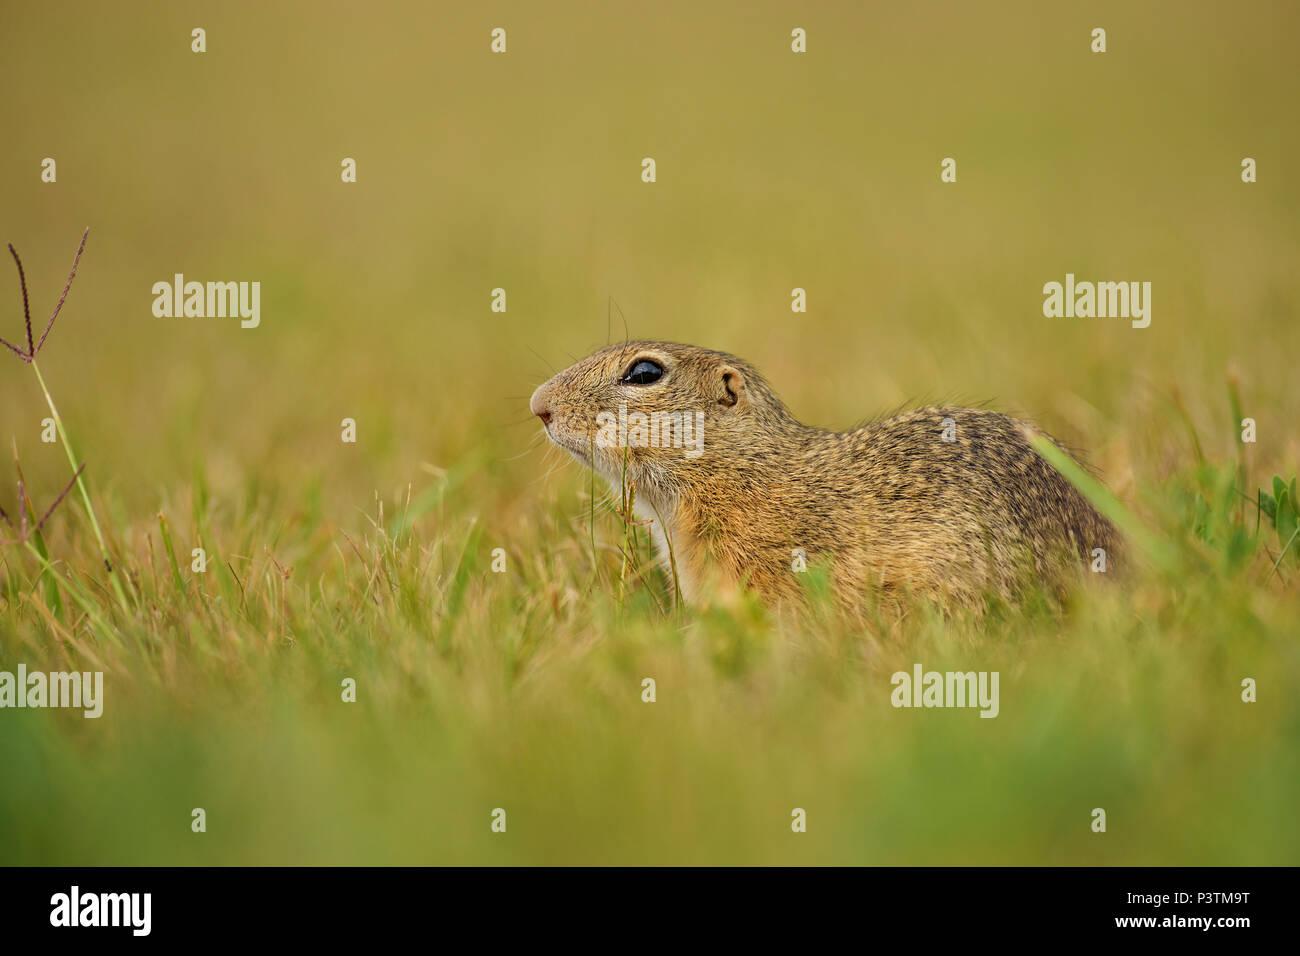 European Ground Squirrel - Spermophilus citellus, cute little ground squirrel from European meadows and fields. Stock Photo